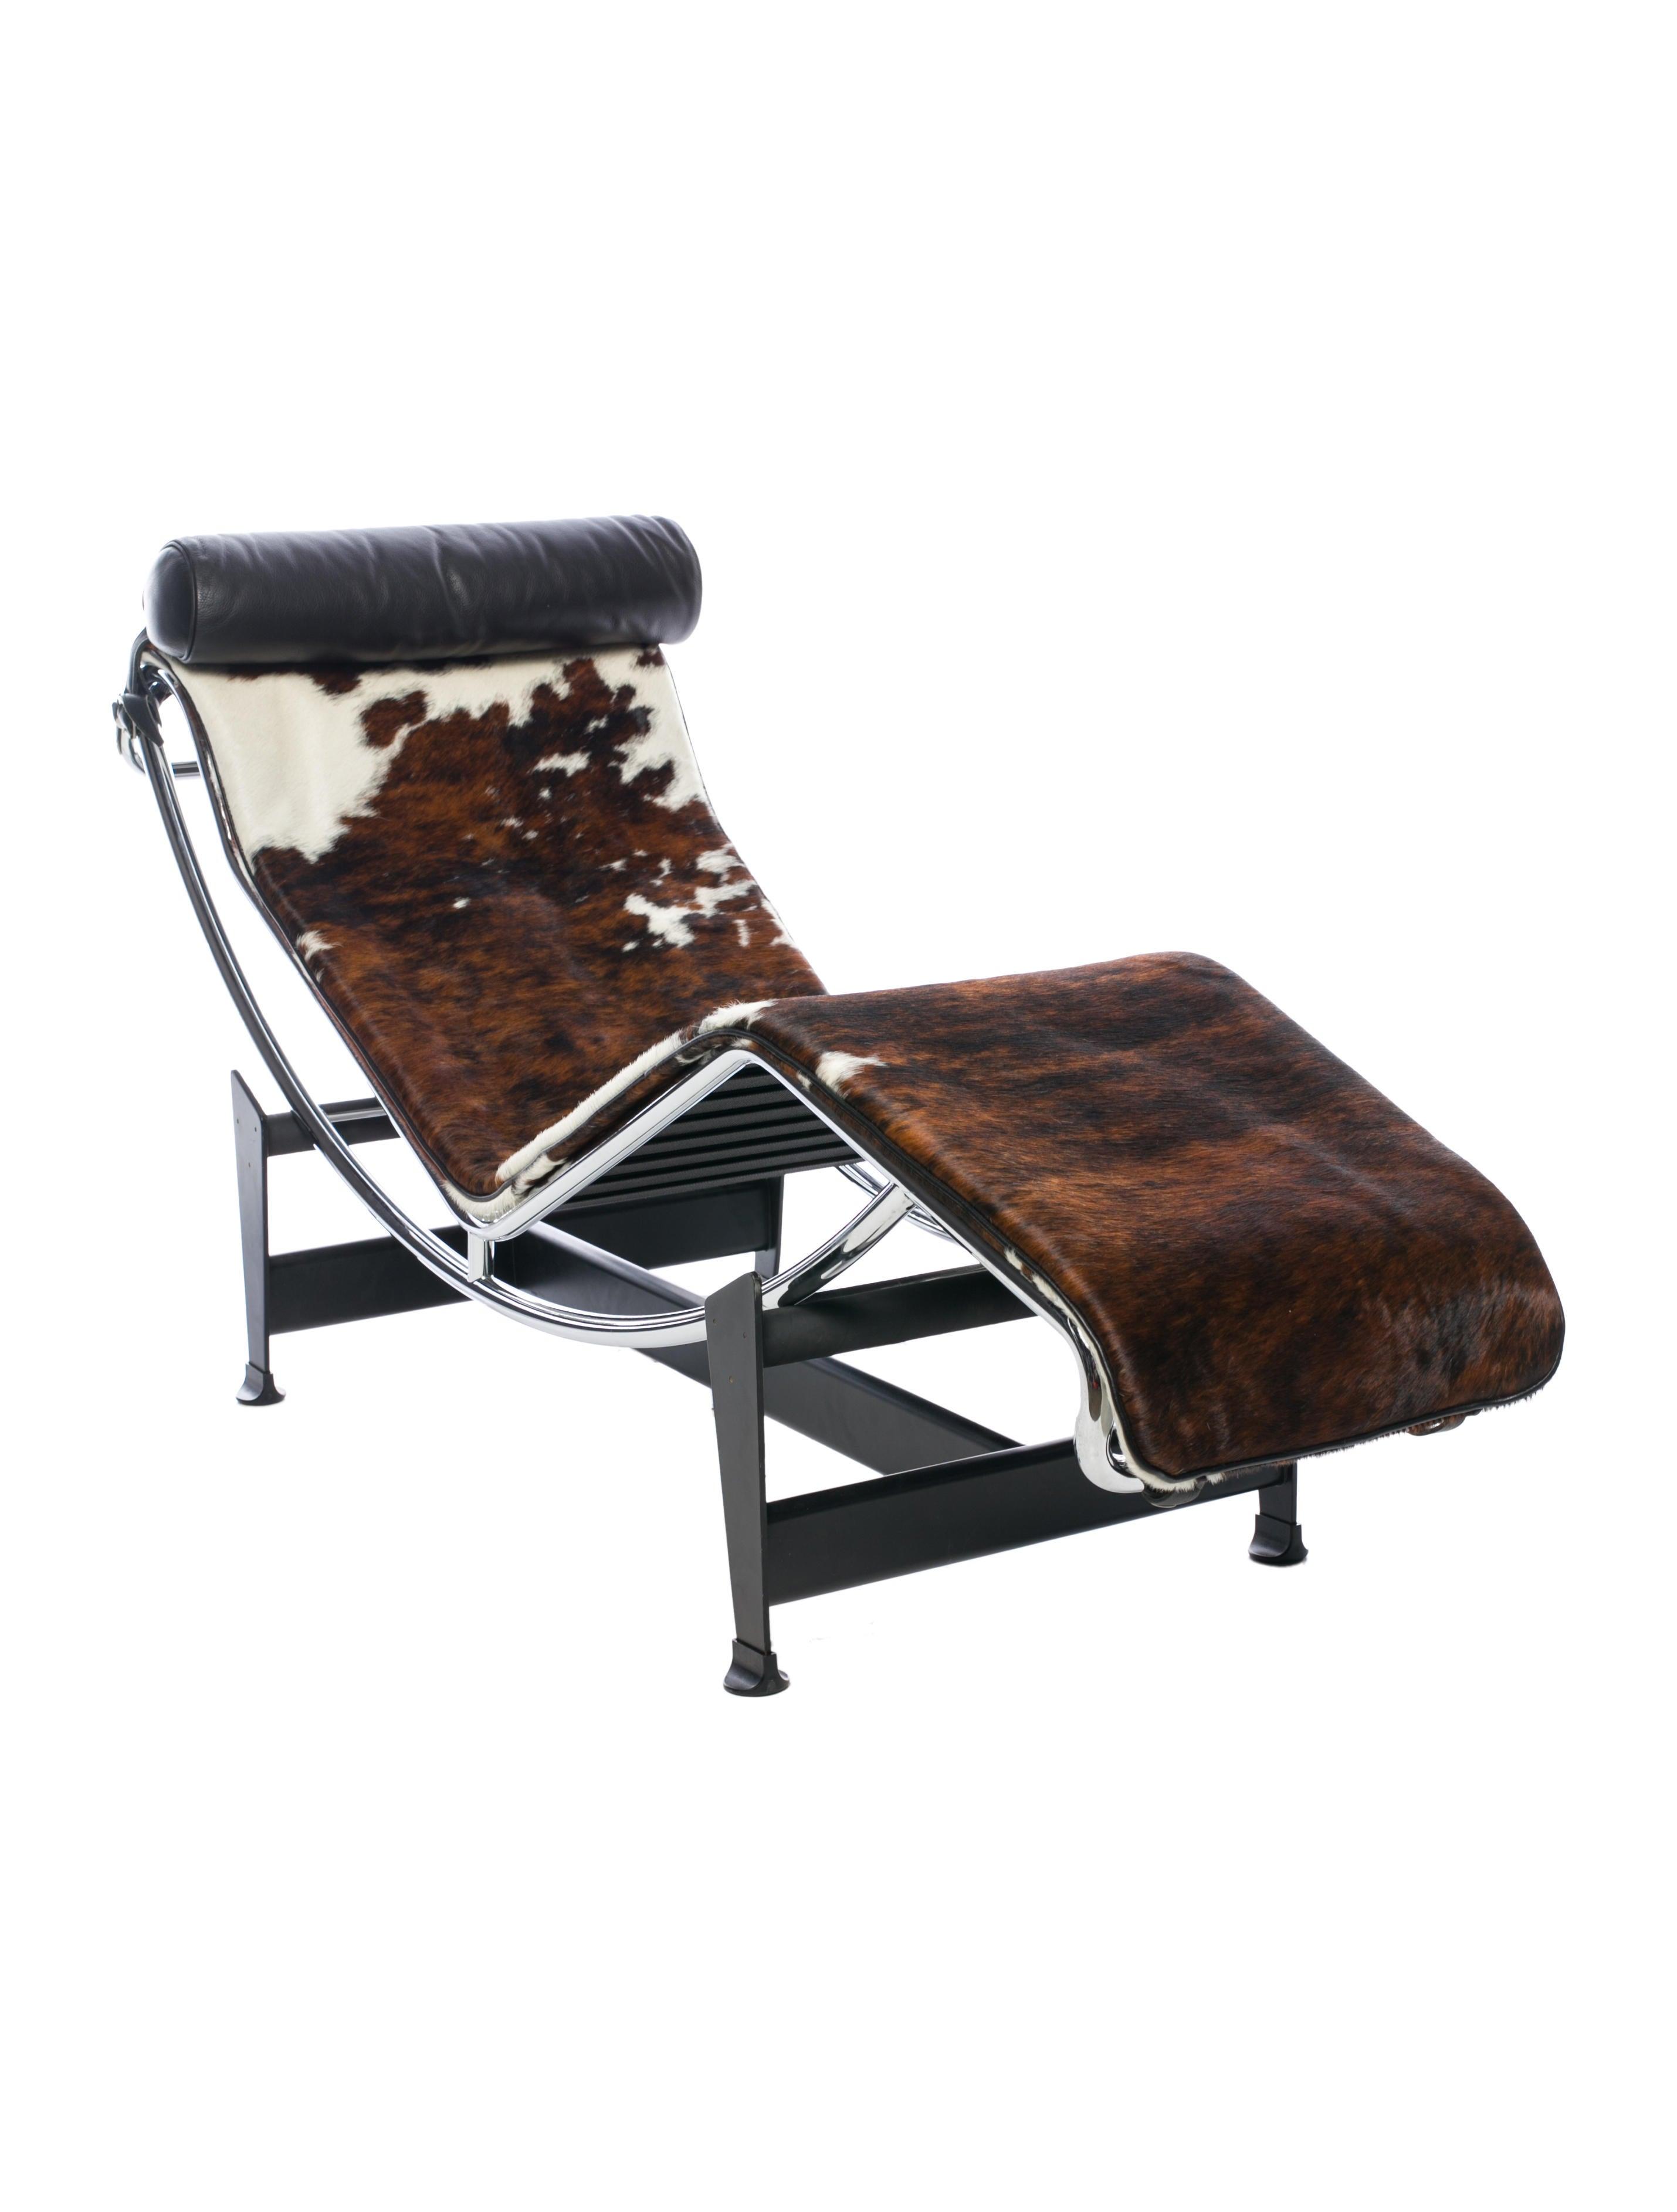 le corbusier lc4 chaise longue furniture cbr20001. Black Bedroom Furniture Sets. Home Design Ideas